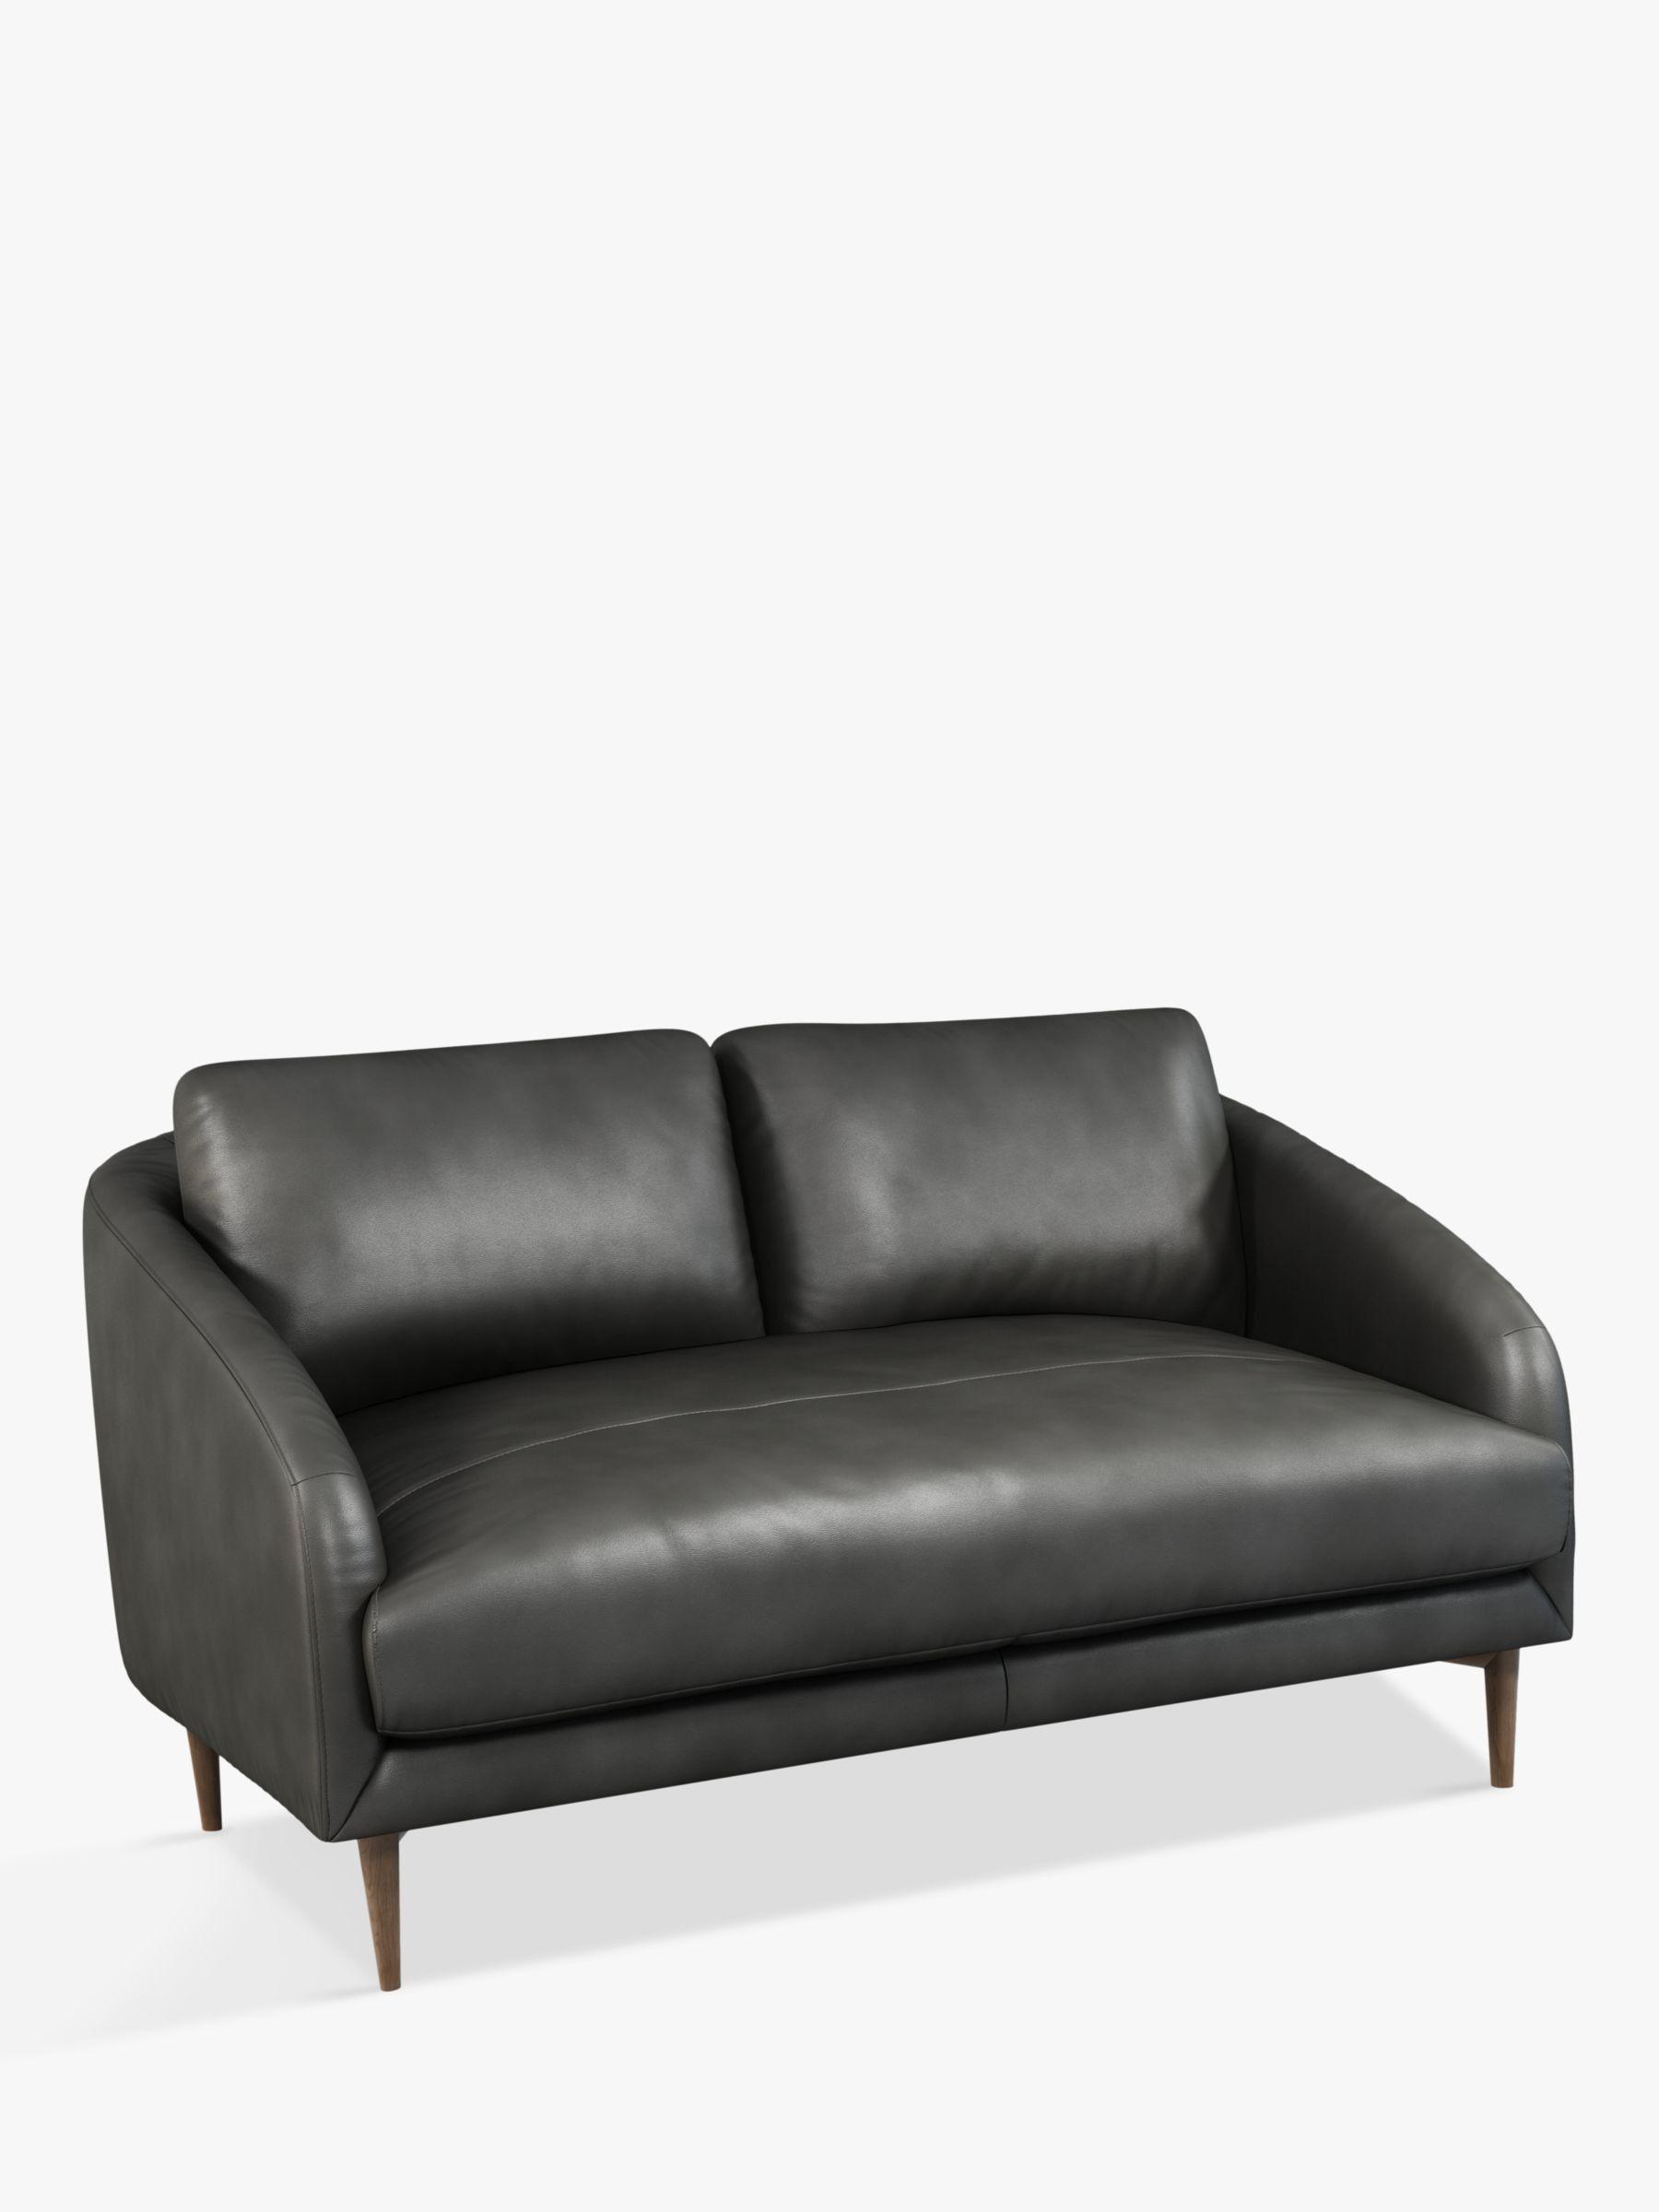 John Lewis Partners Cape Small 2 Seater Leather Sofa Dark Leg